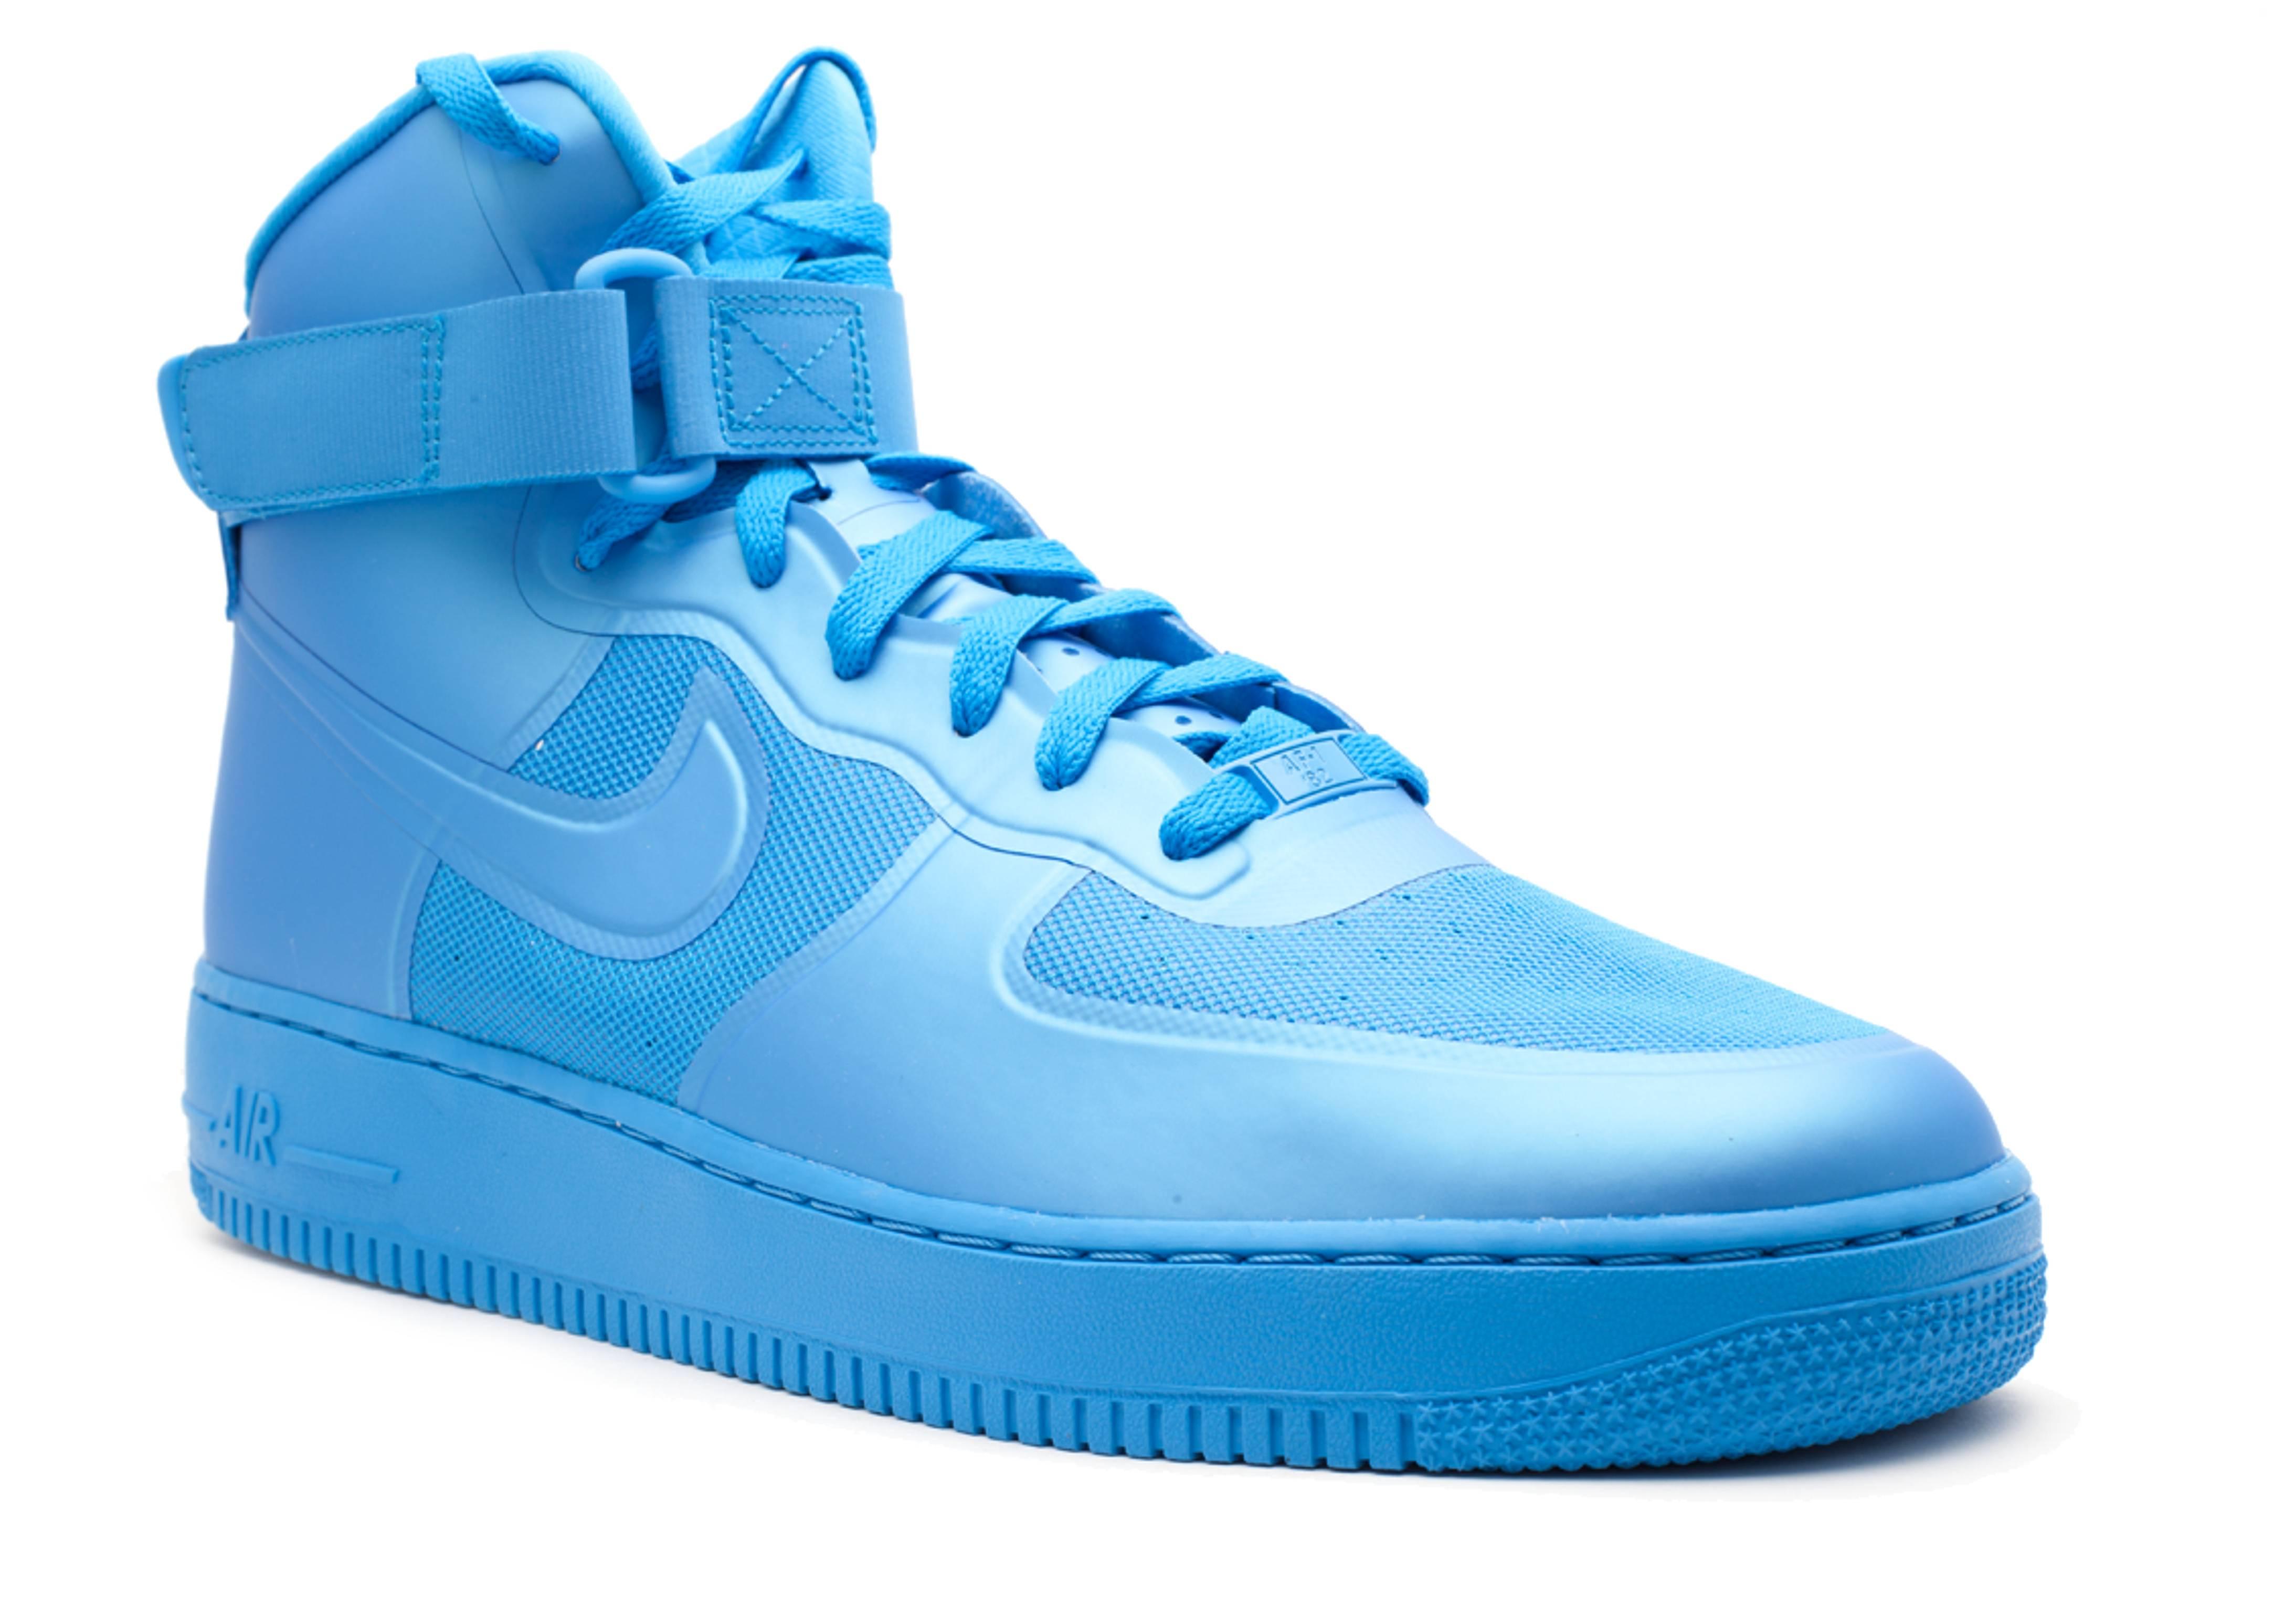 Nike Air Force 1 Hi Hyperfuse Premium Blue Glow 2011 454433